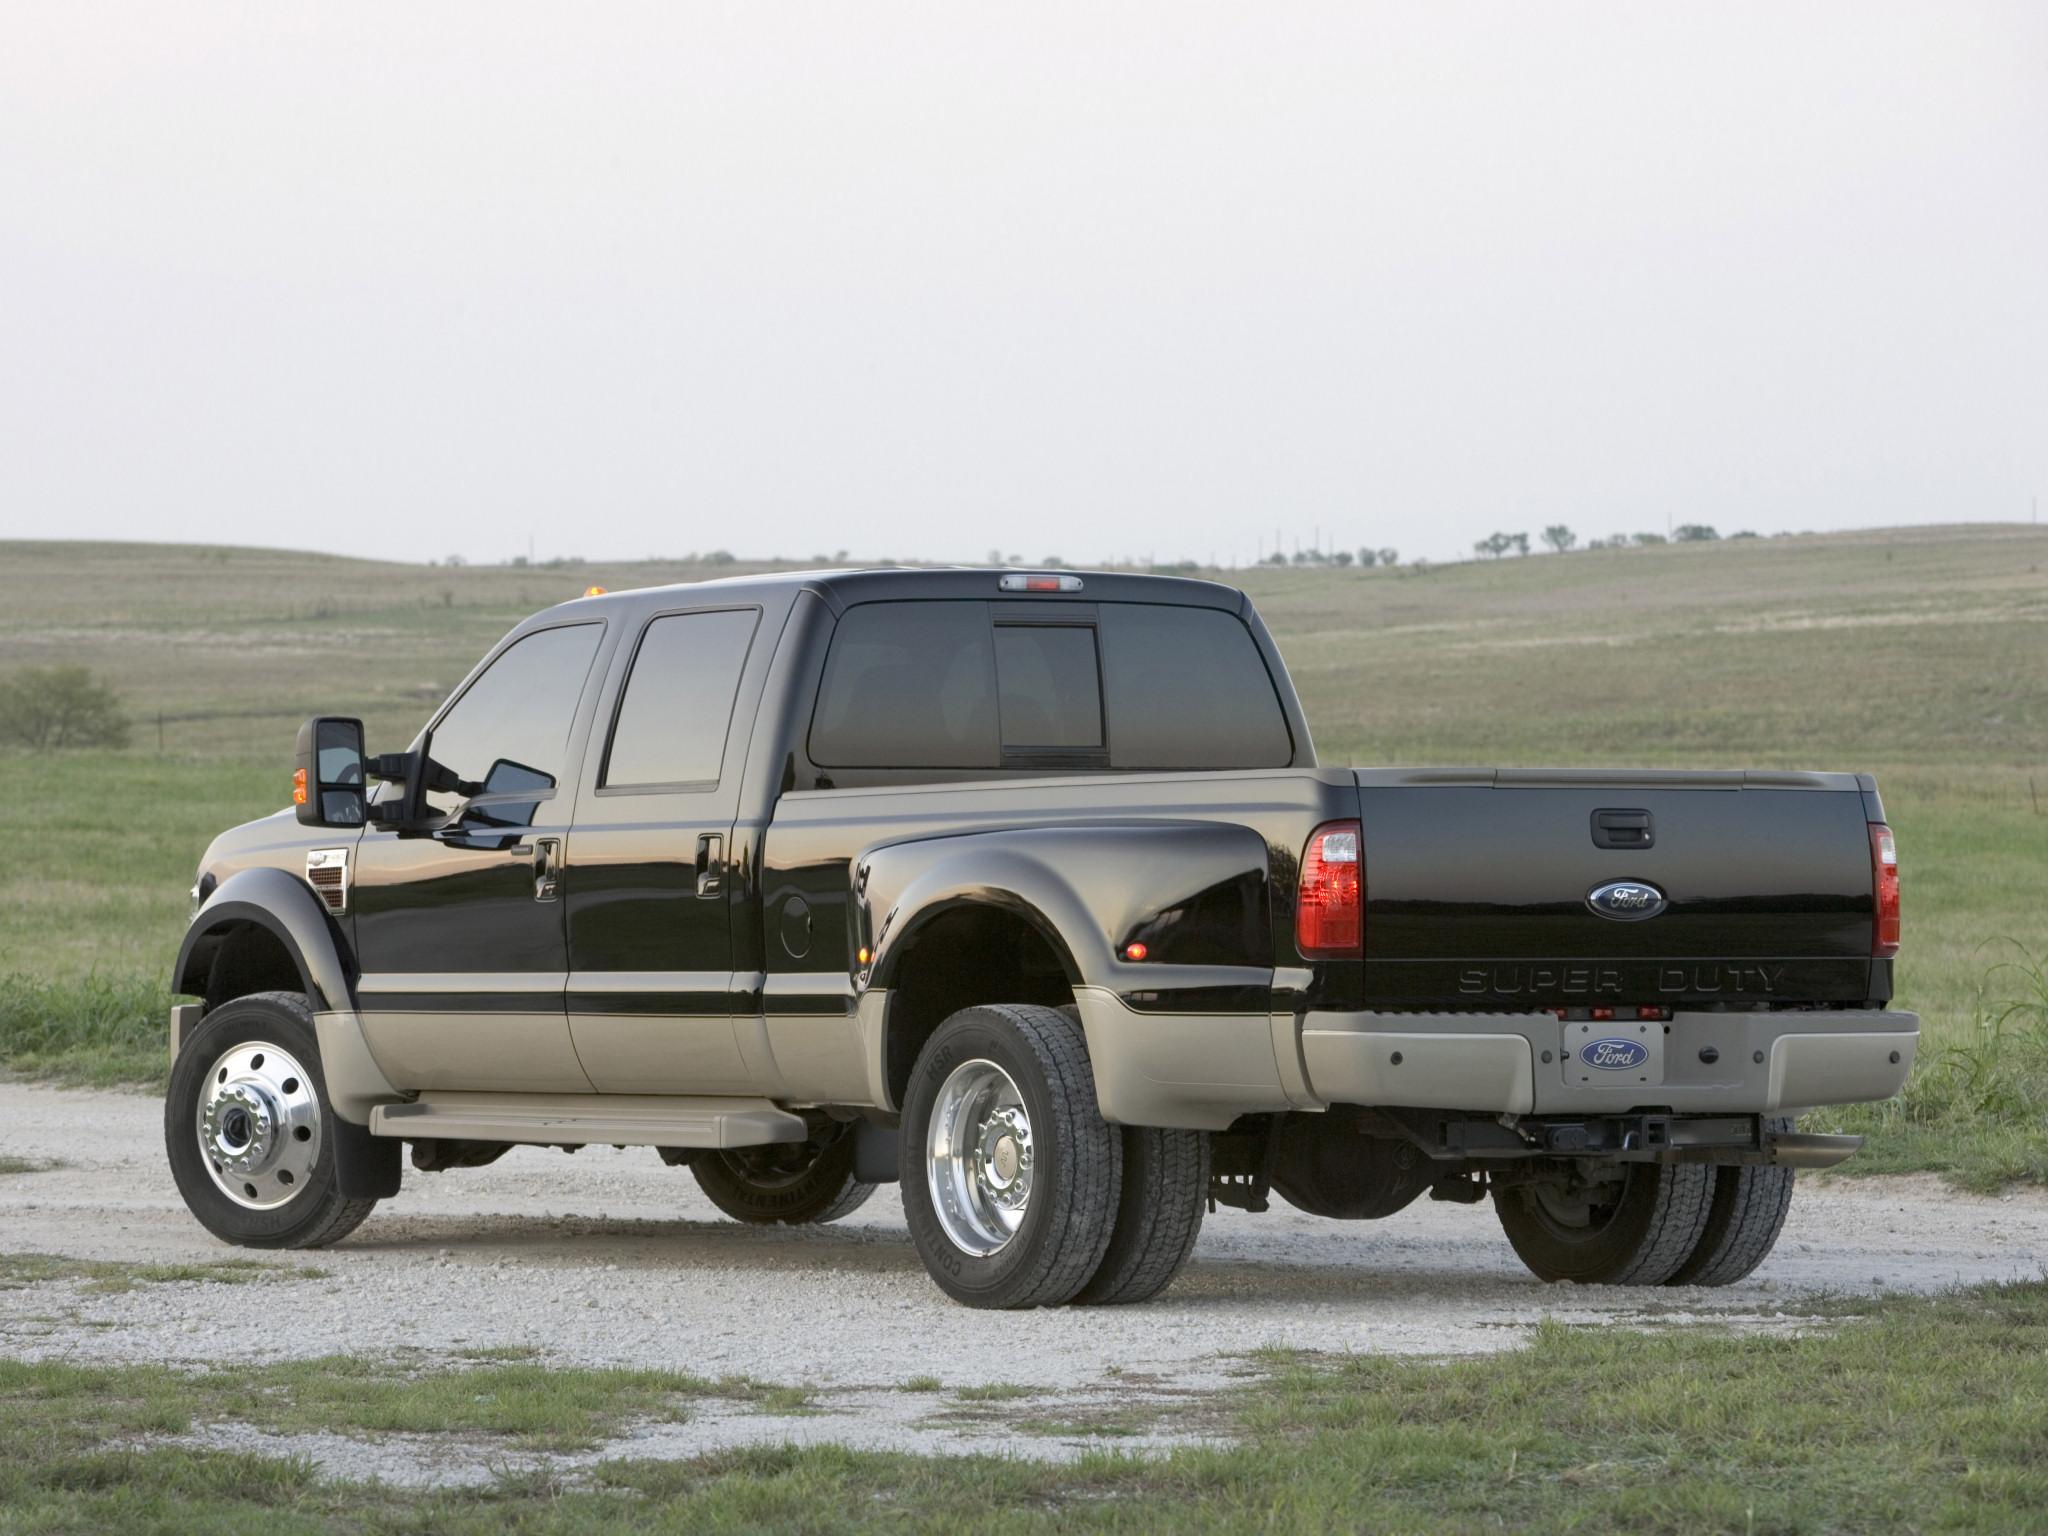 2008 Ford F 450 SuperDuty truck 4x4 g wallpaper background 2048x1536